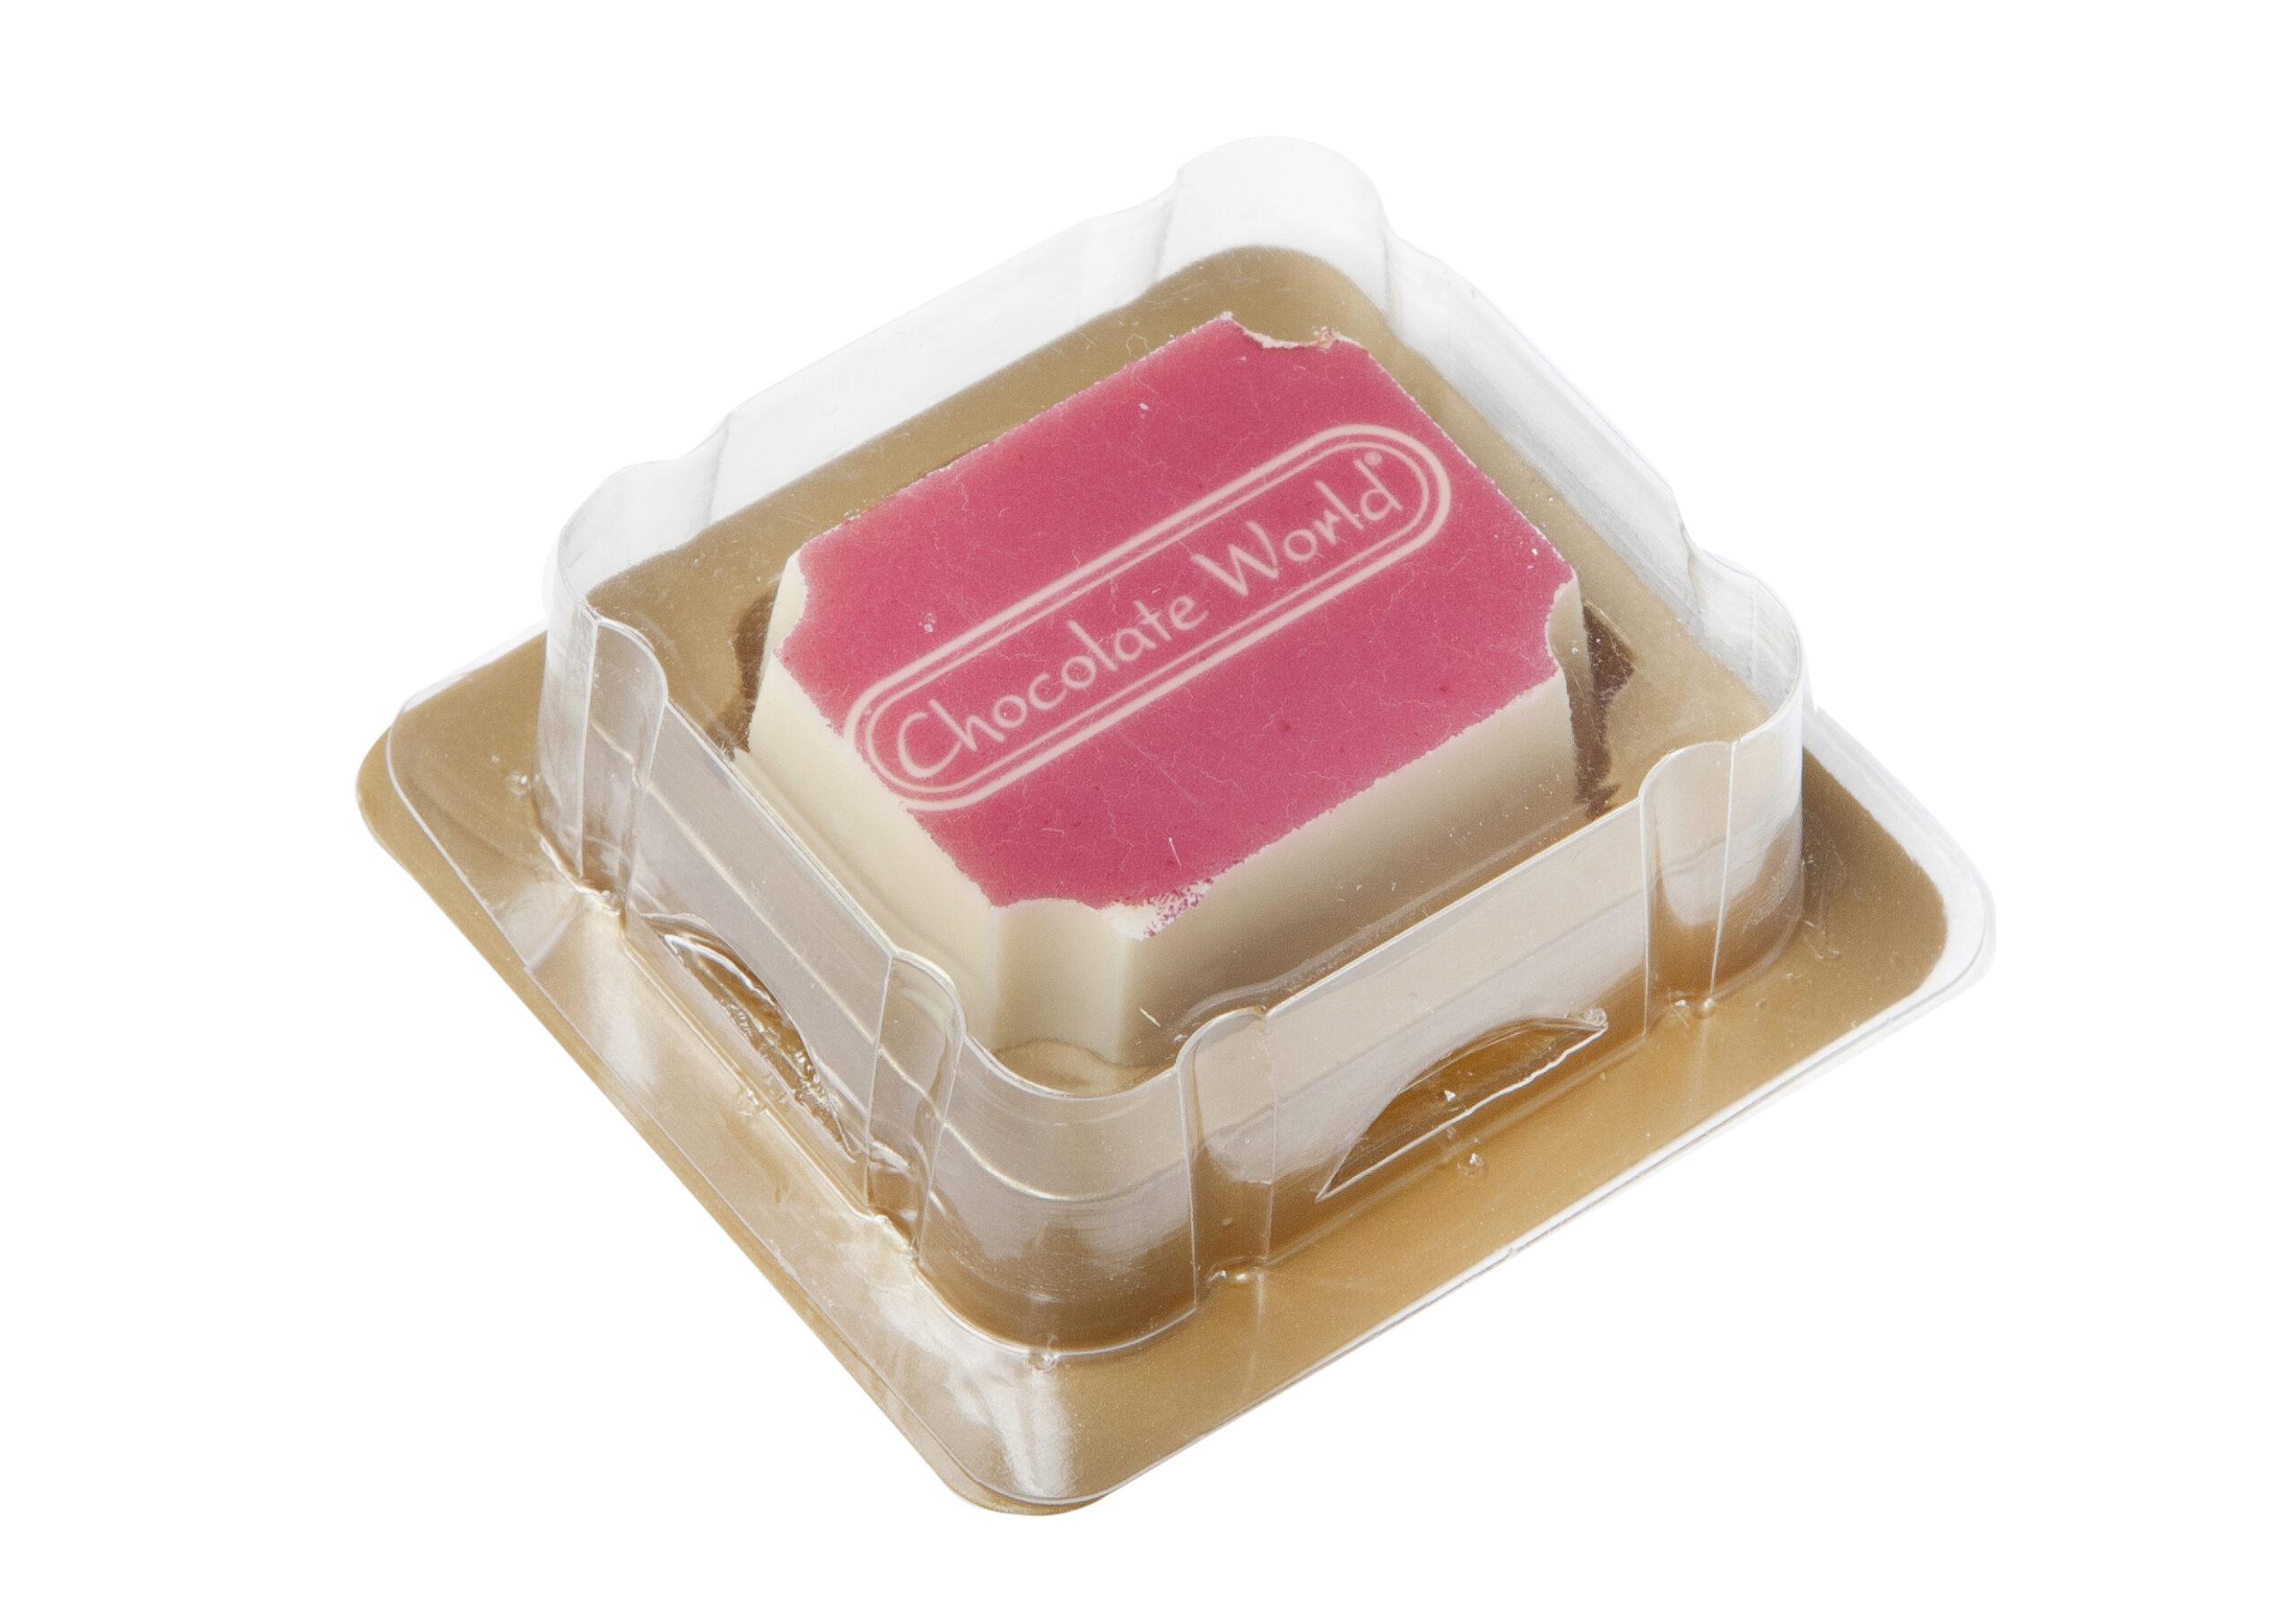 Box for logo chocolates